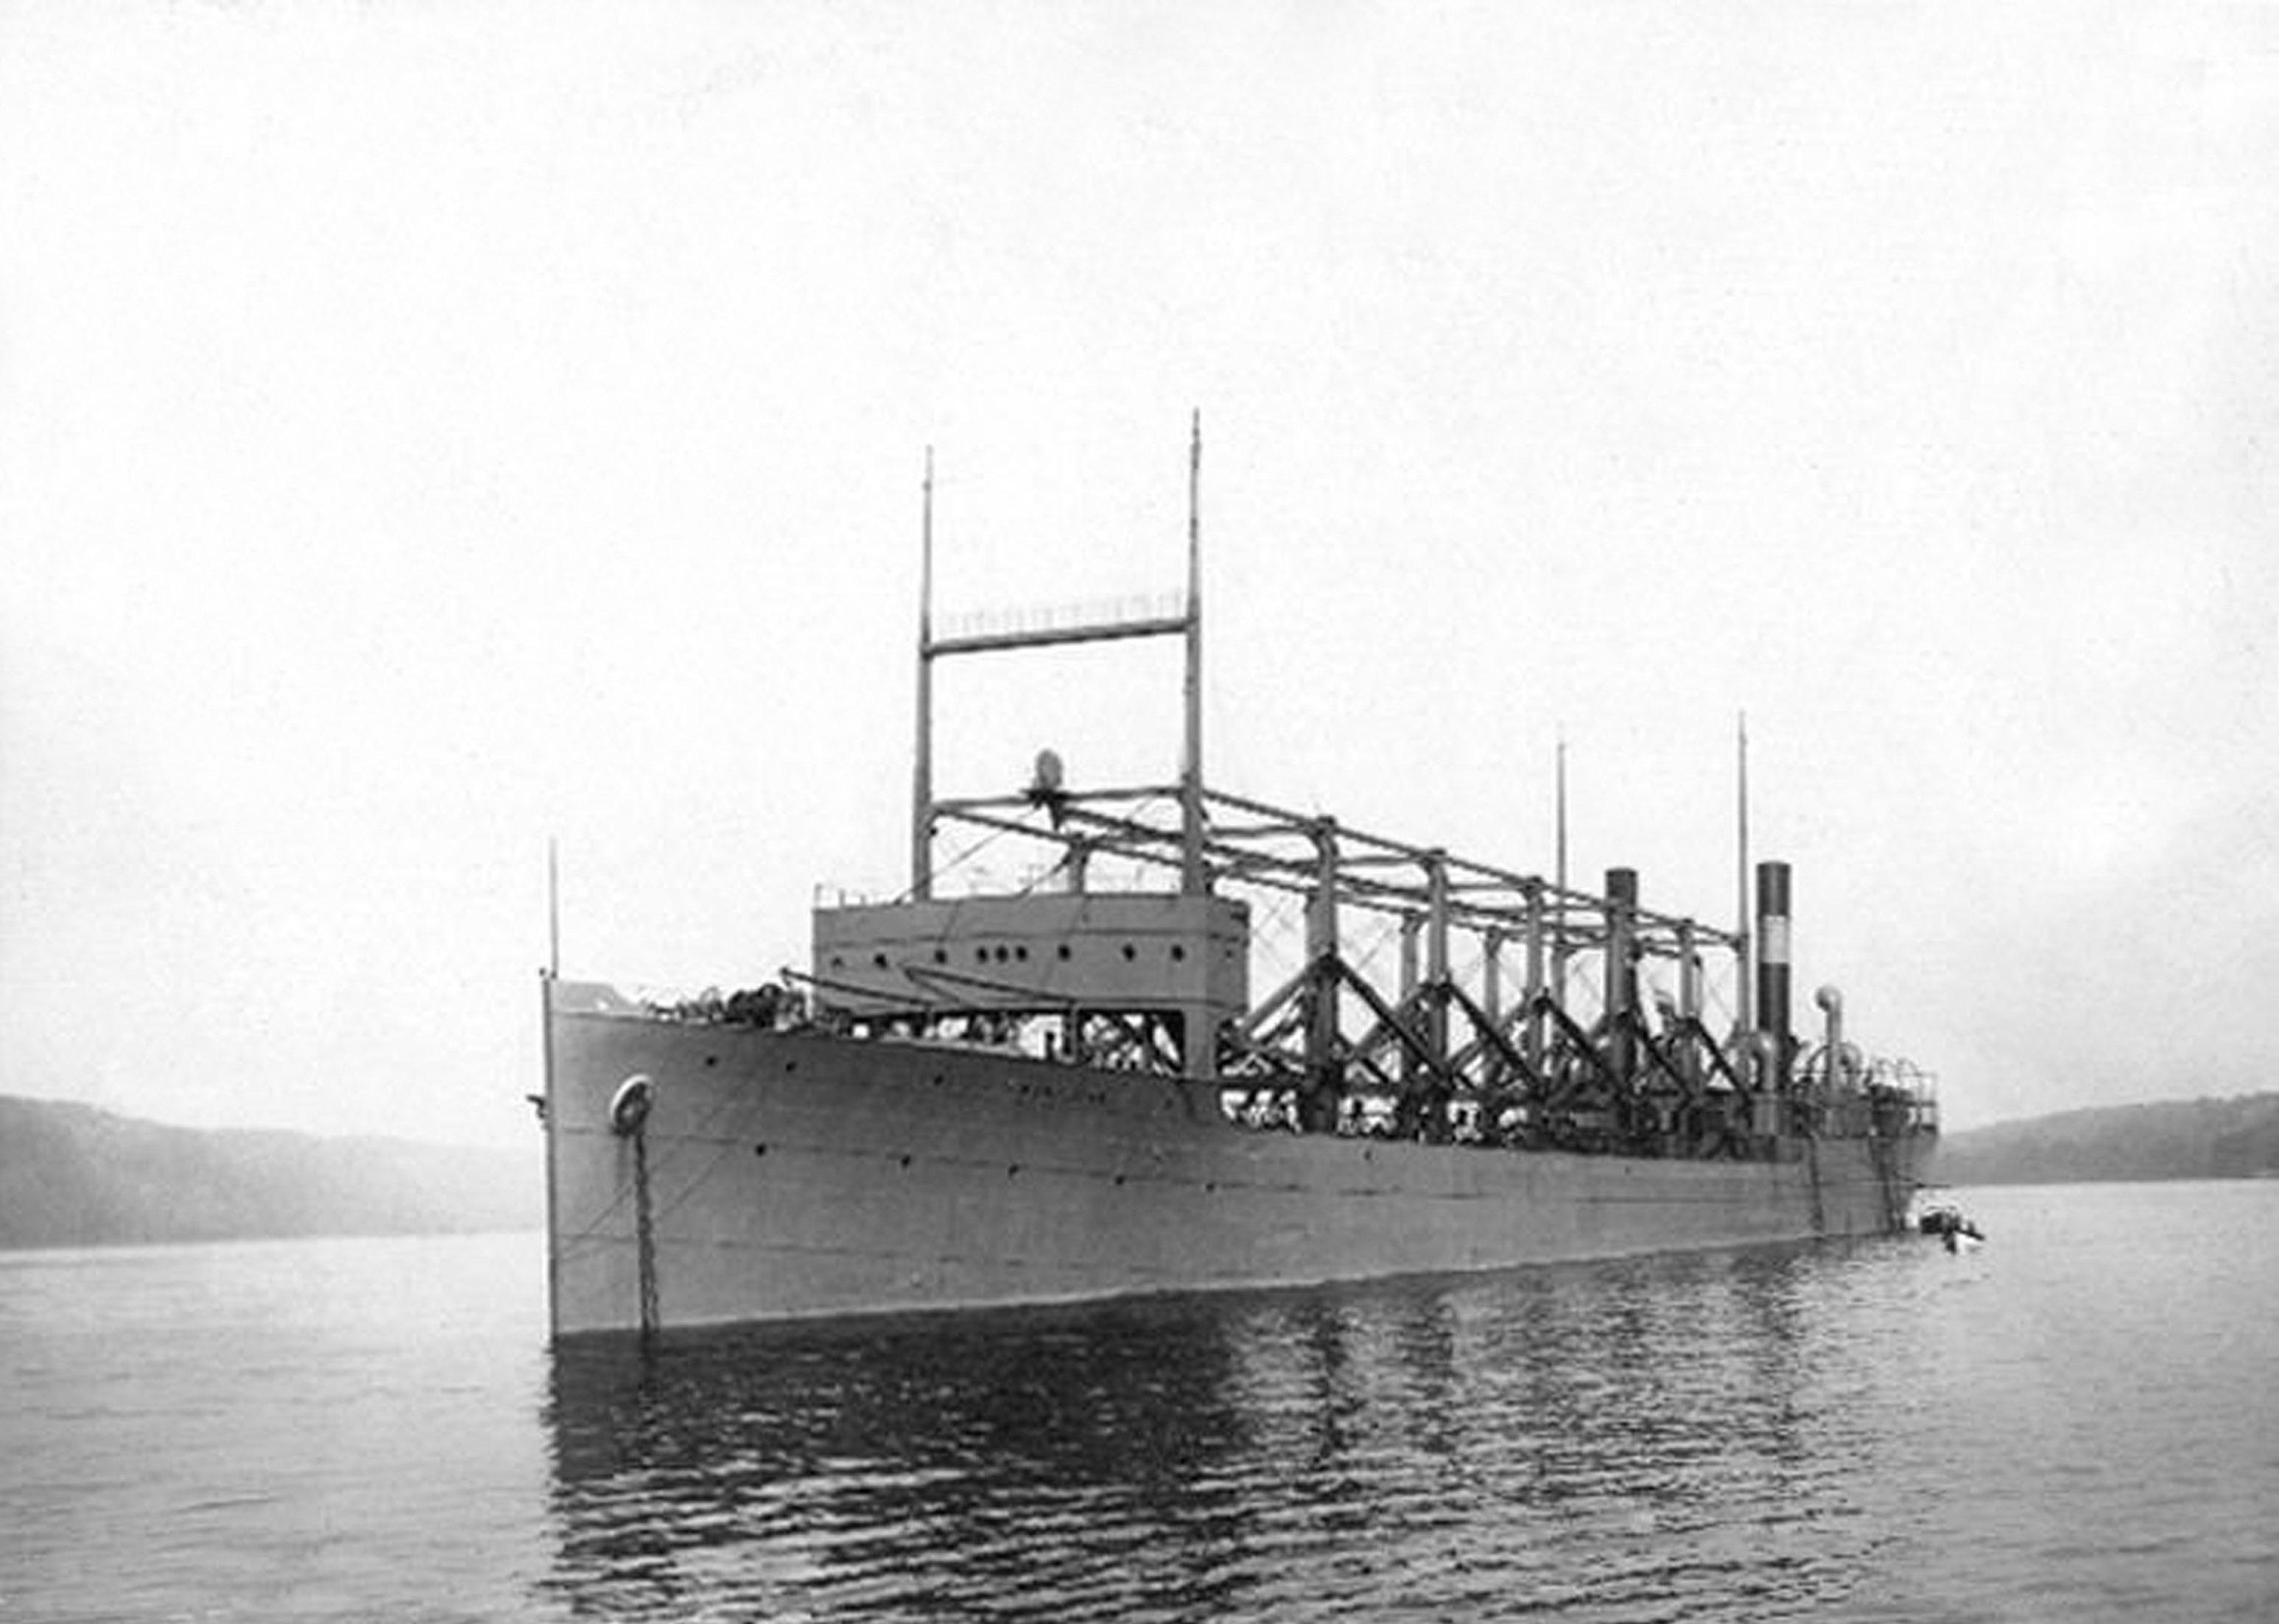 The USS Cyclops (Getty)